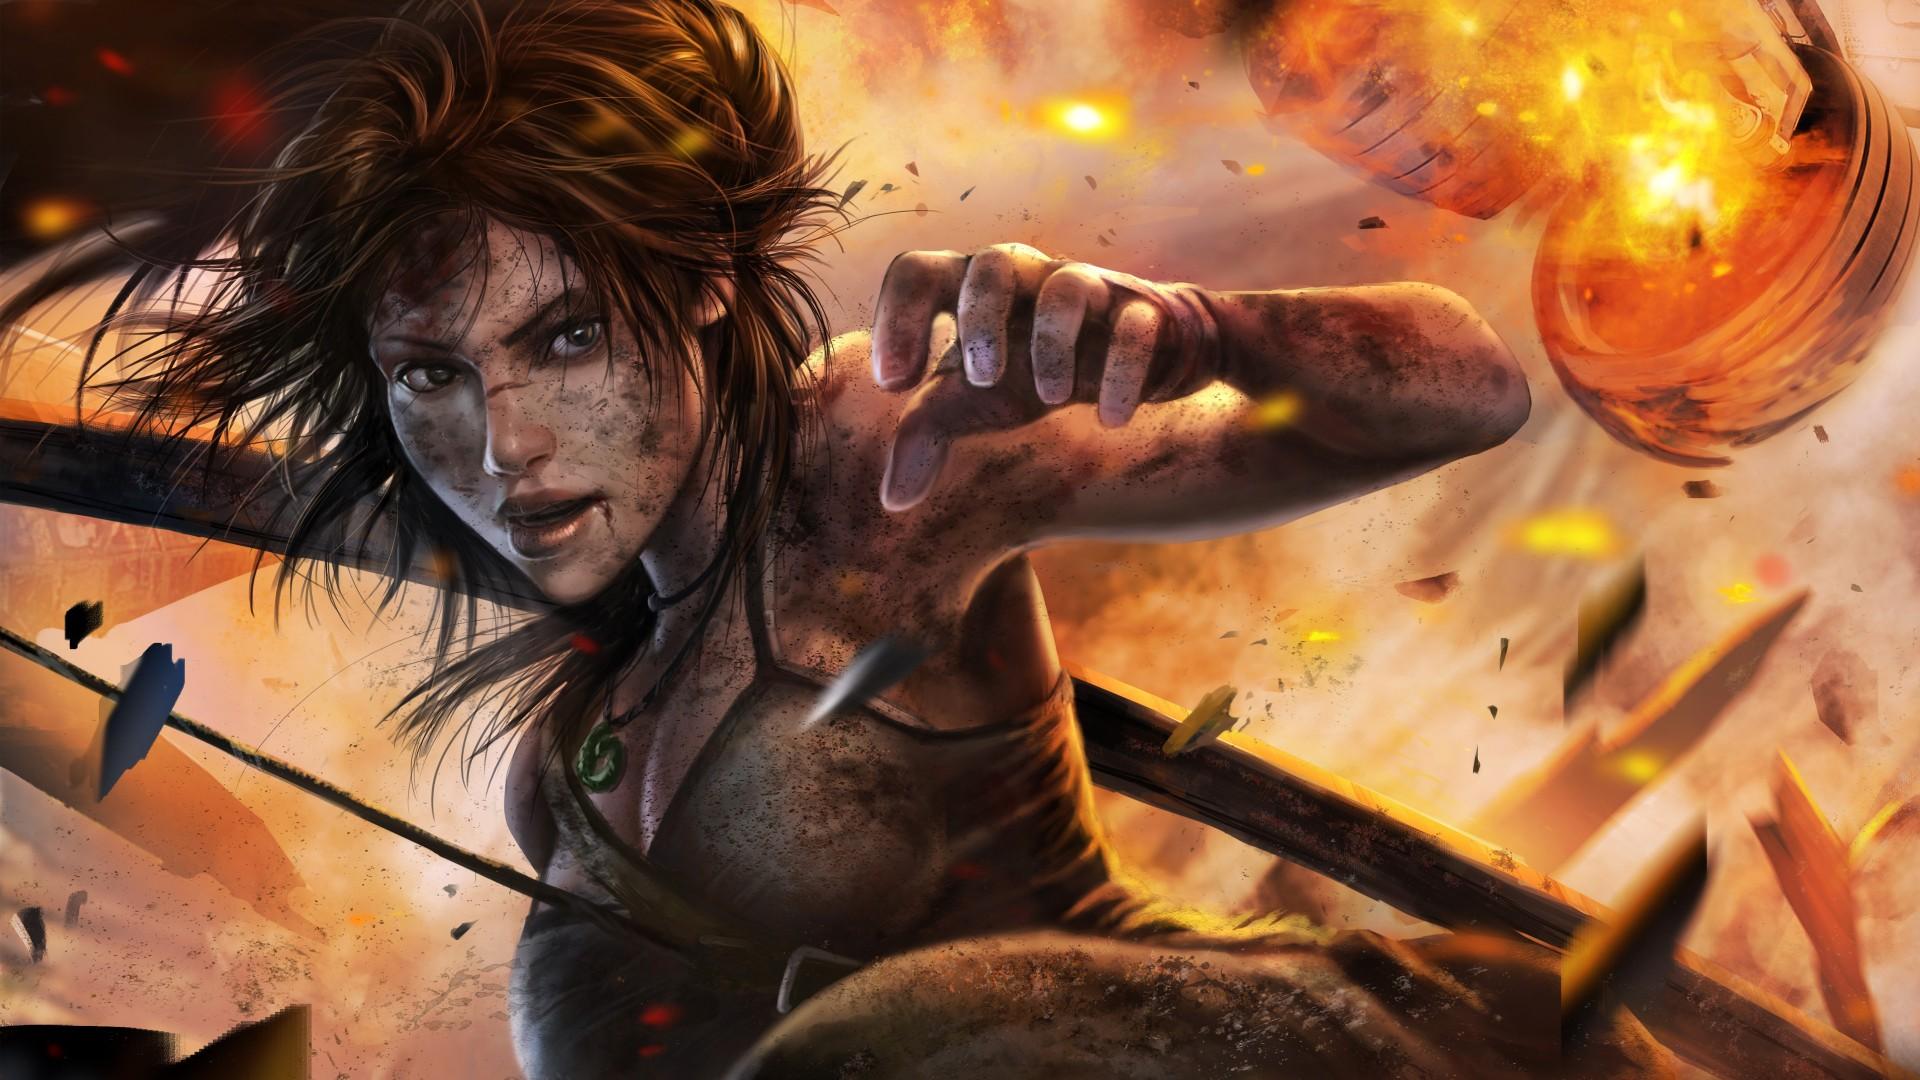 Beach Girl 4k Wallpaper Tomb Raider Lara Croft Wallpapers Hd Wallpapers Id 17389